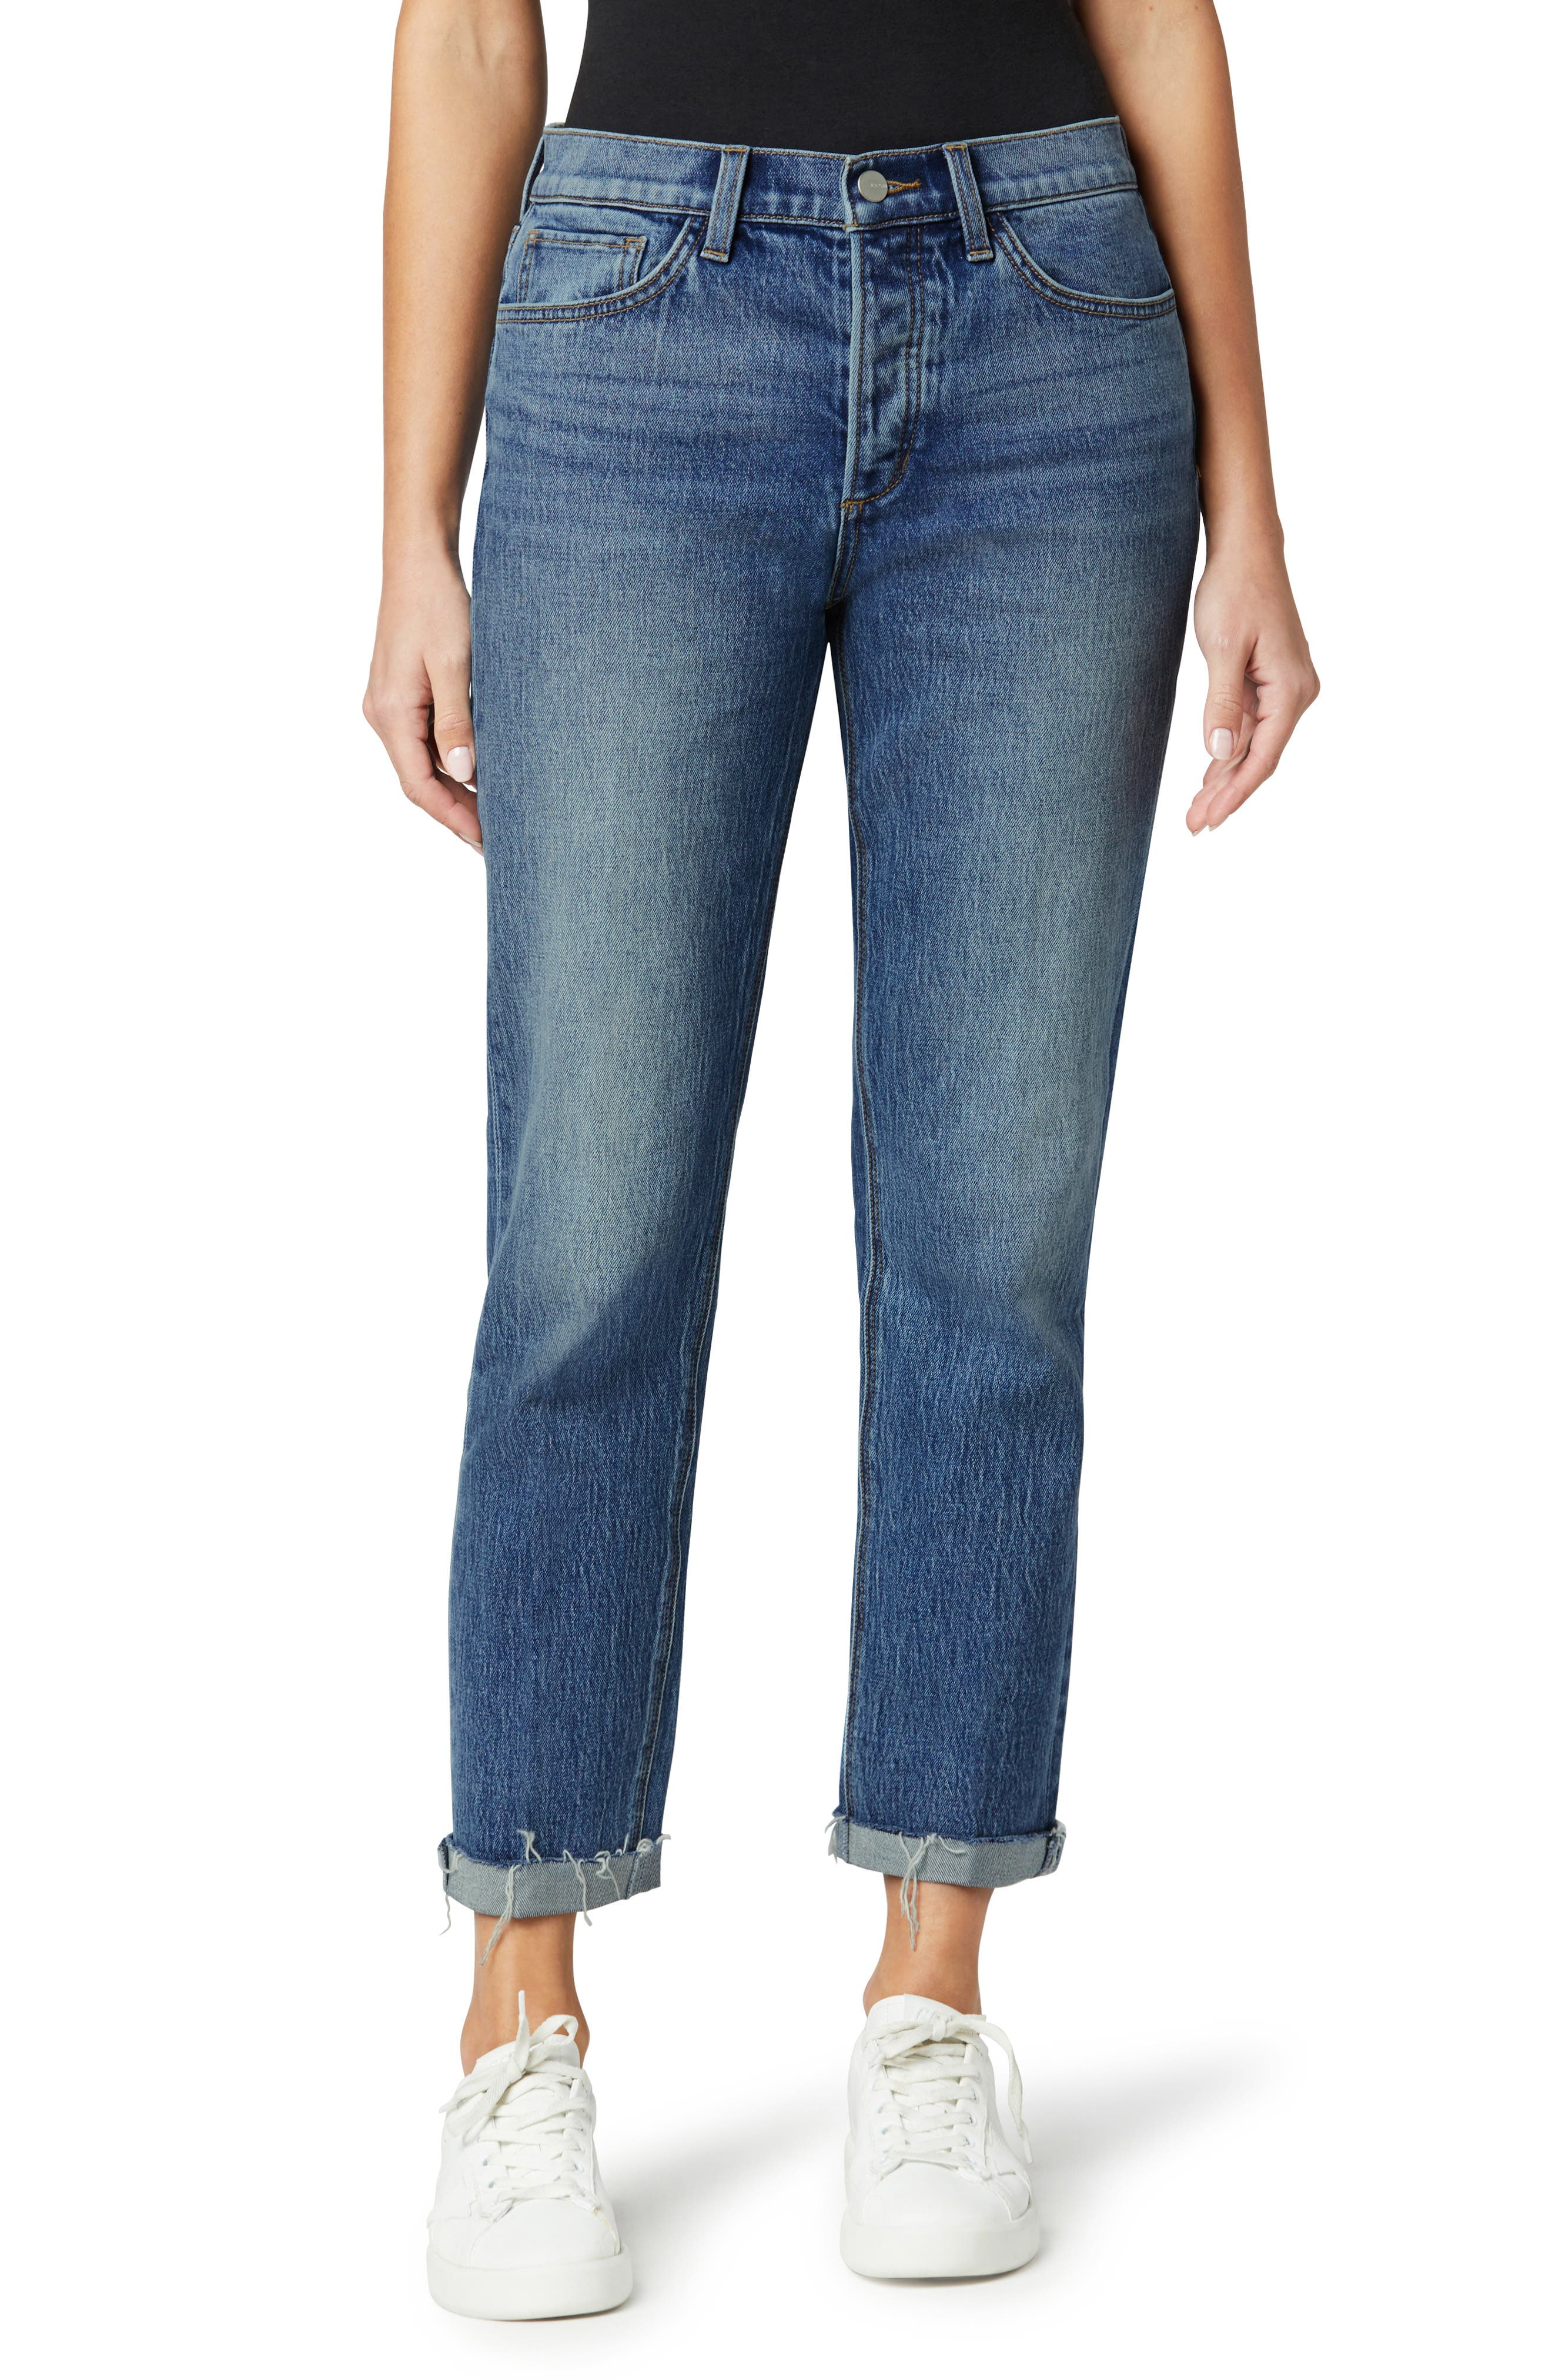 Women's Joes' The Scout High Waist Roll Cuff Straight Leg Jeans